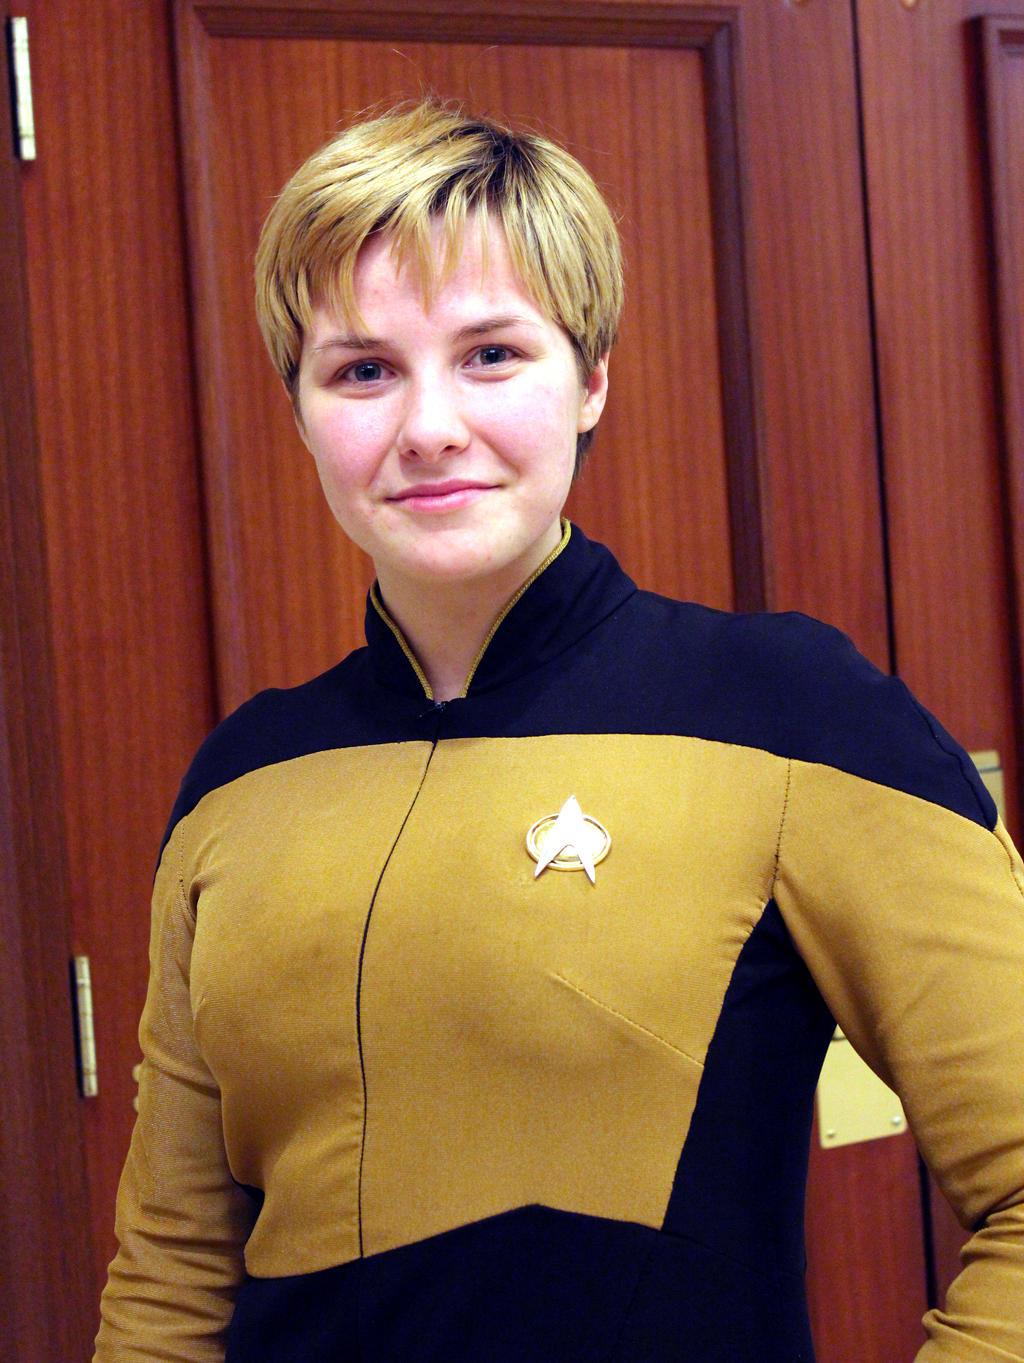 Lieutenant Tasha Yar  Anime Boston 2013 by geekypandaphotobox